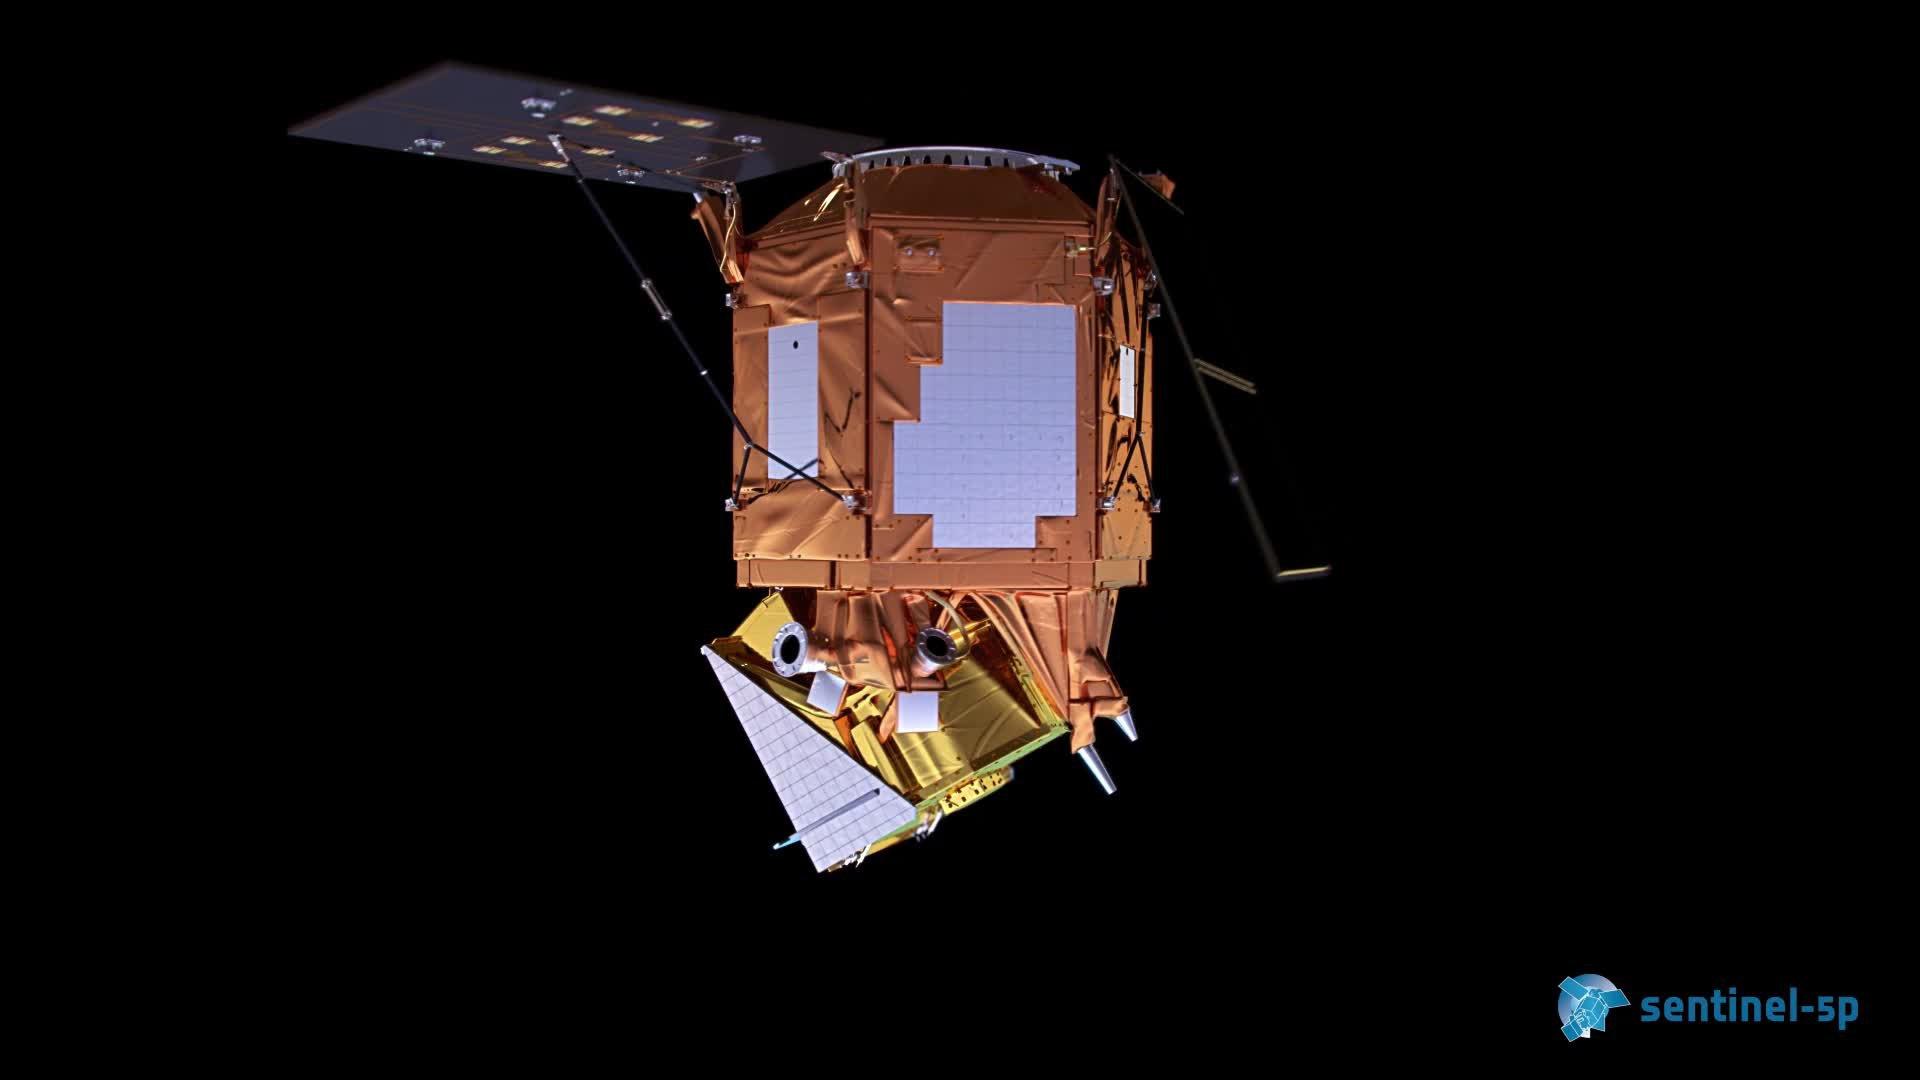 Sentinel-5p - Solar Array Deployment